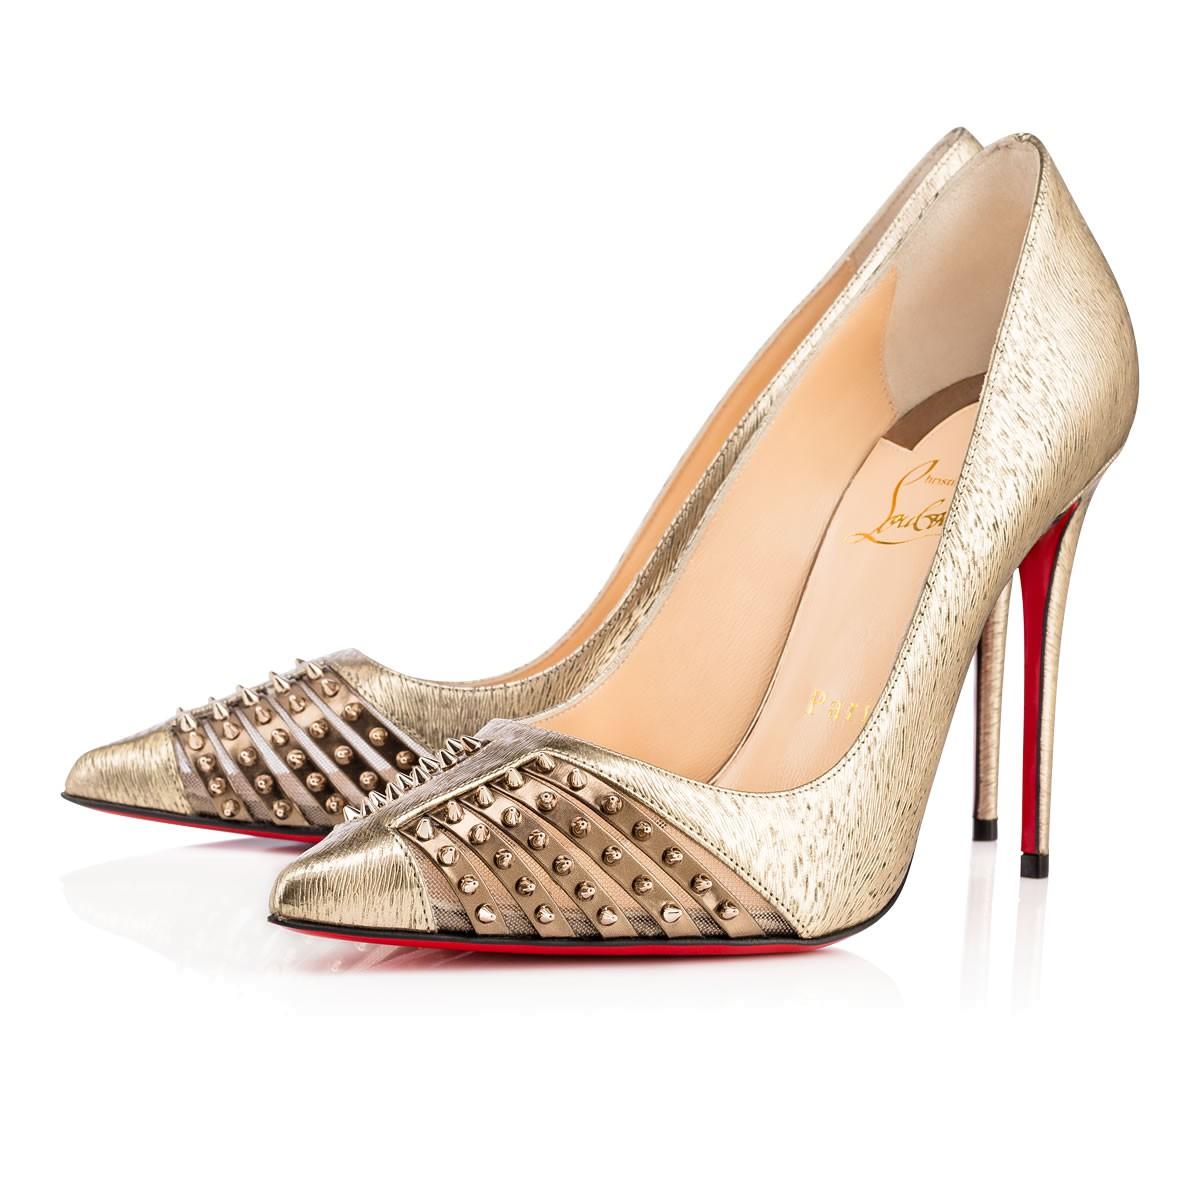 scarpe louboutin 2016